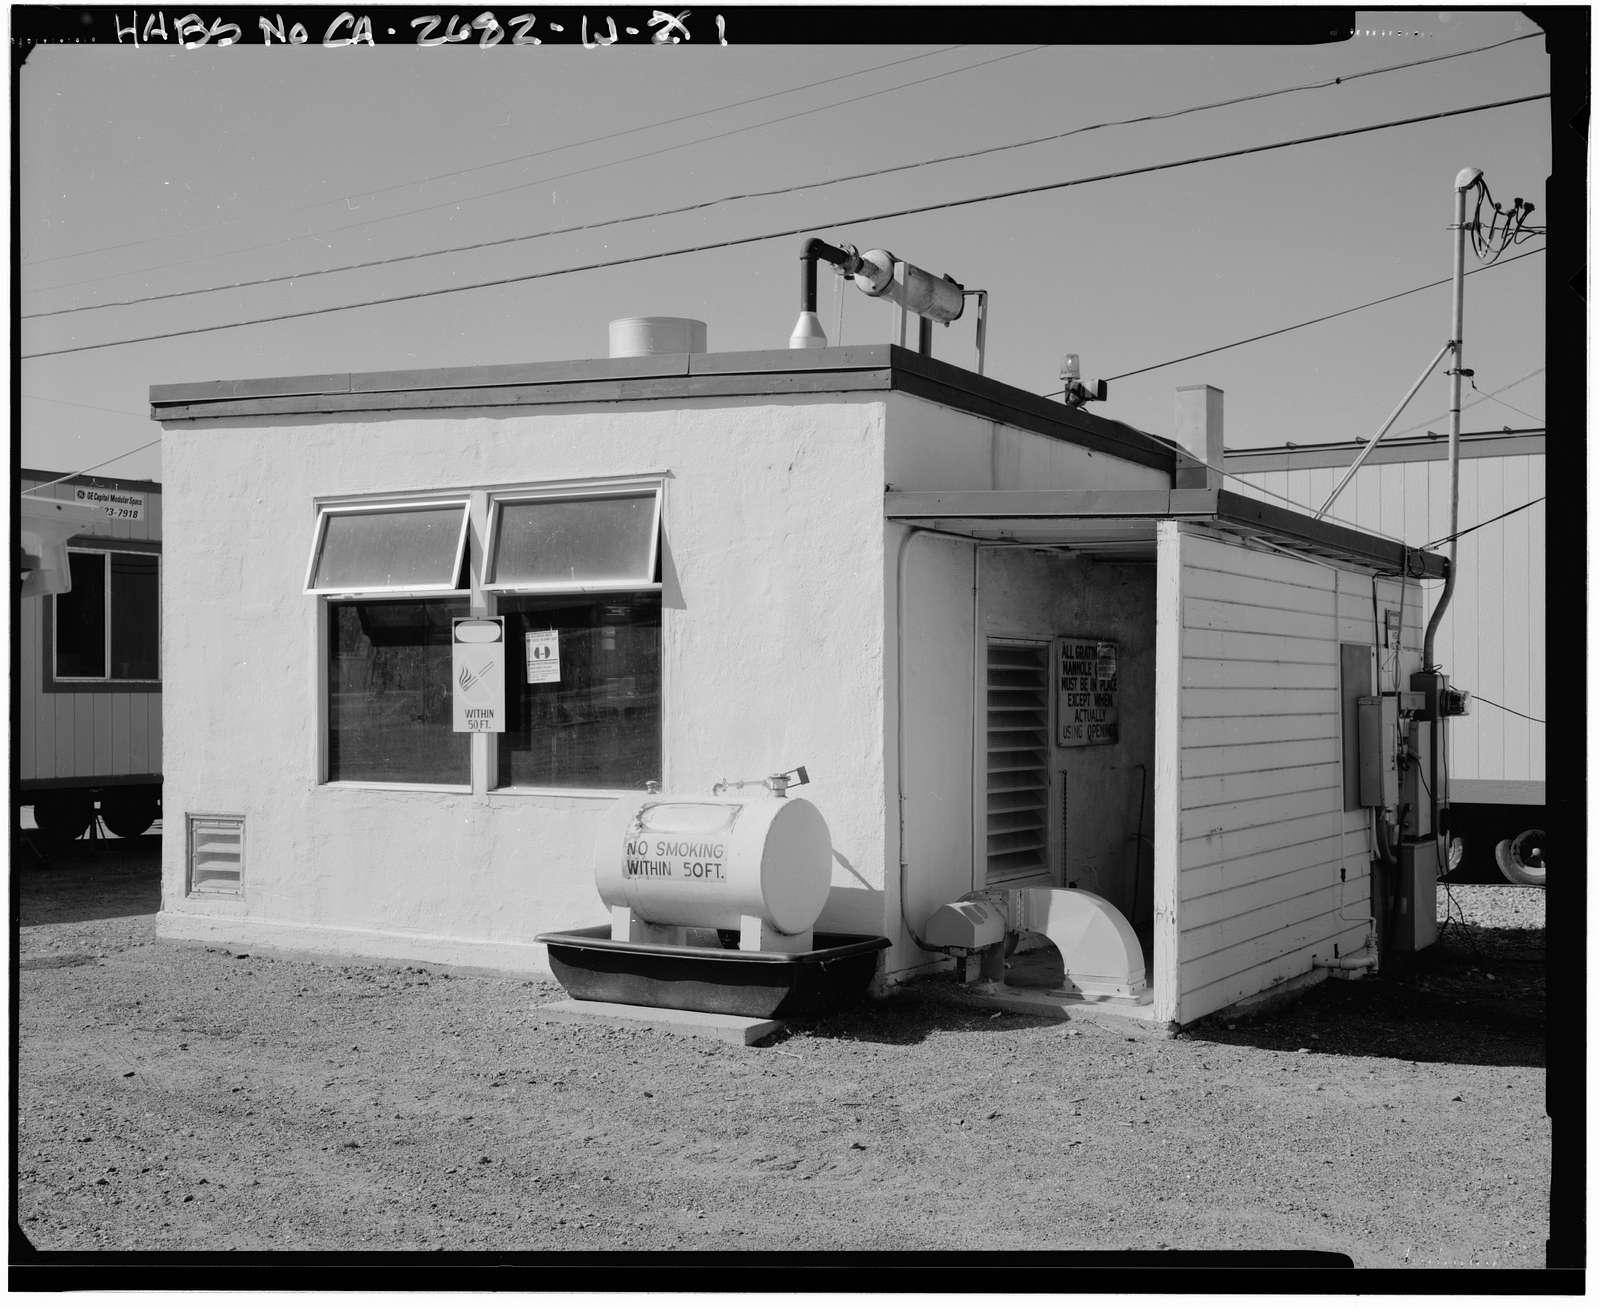 Naval Supply Annex Stockton, Sanitary Sewer, Between Fyffe & Davis Avenues & Humphreys Drive, Stockton, San Joaquin County, CA